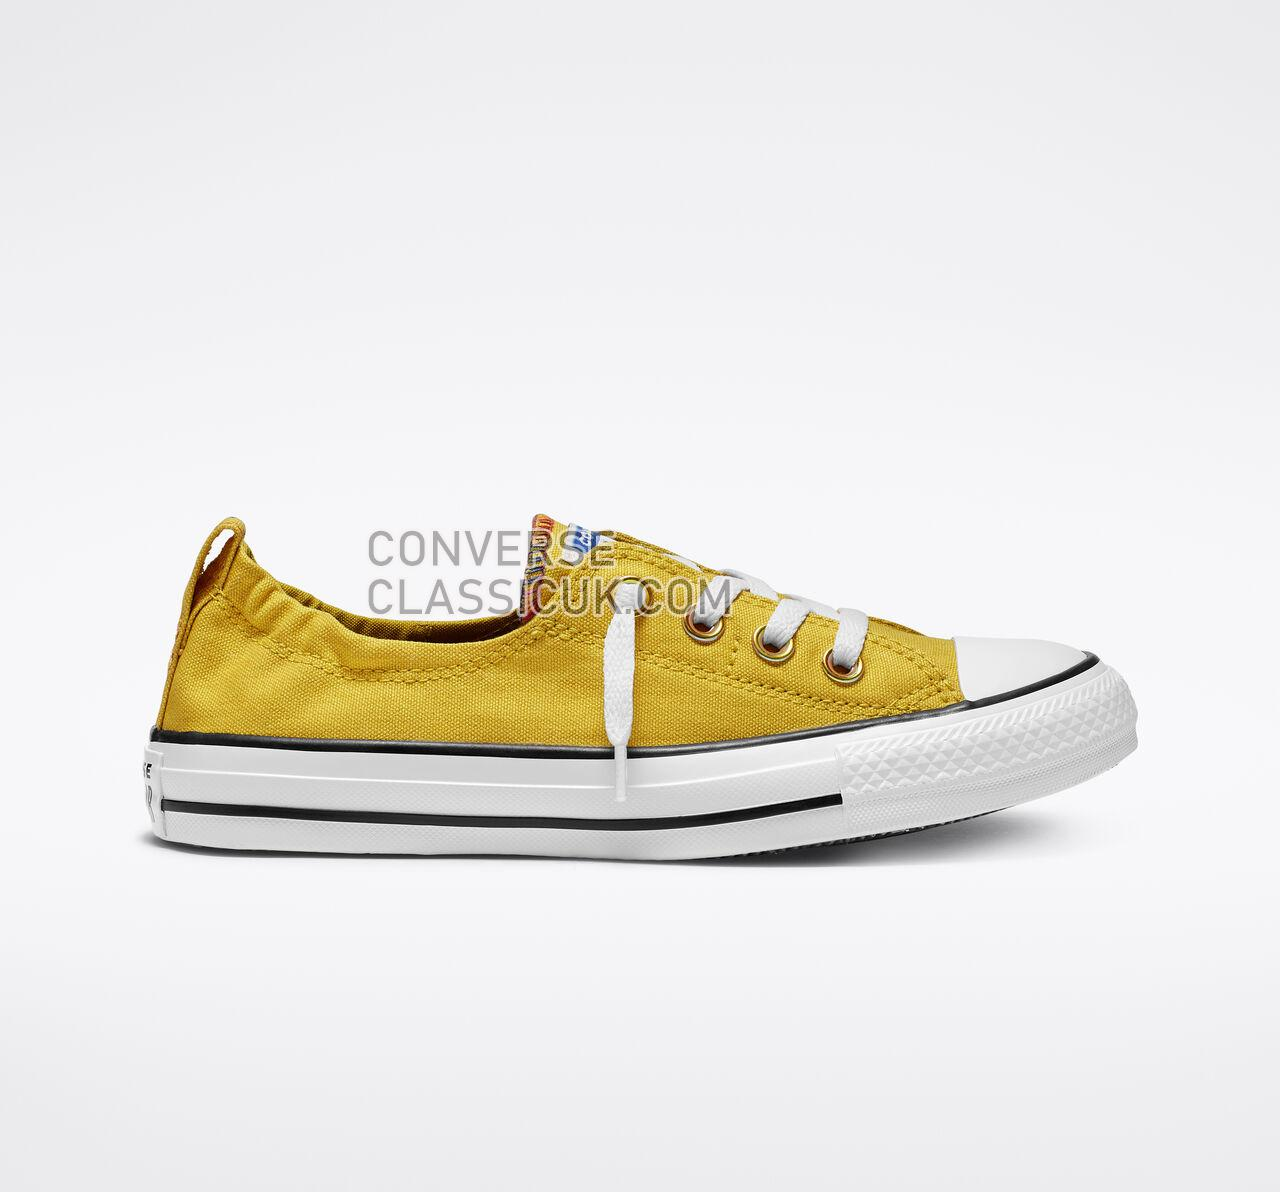 Converse Chuck Taylor All Star Shoreline Slip Womens 565442F Vivid Sulfur/White/Black Shoes